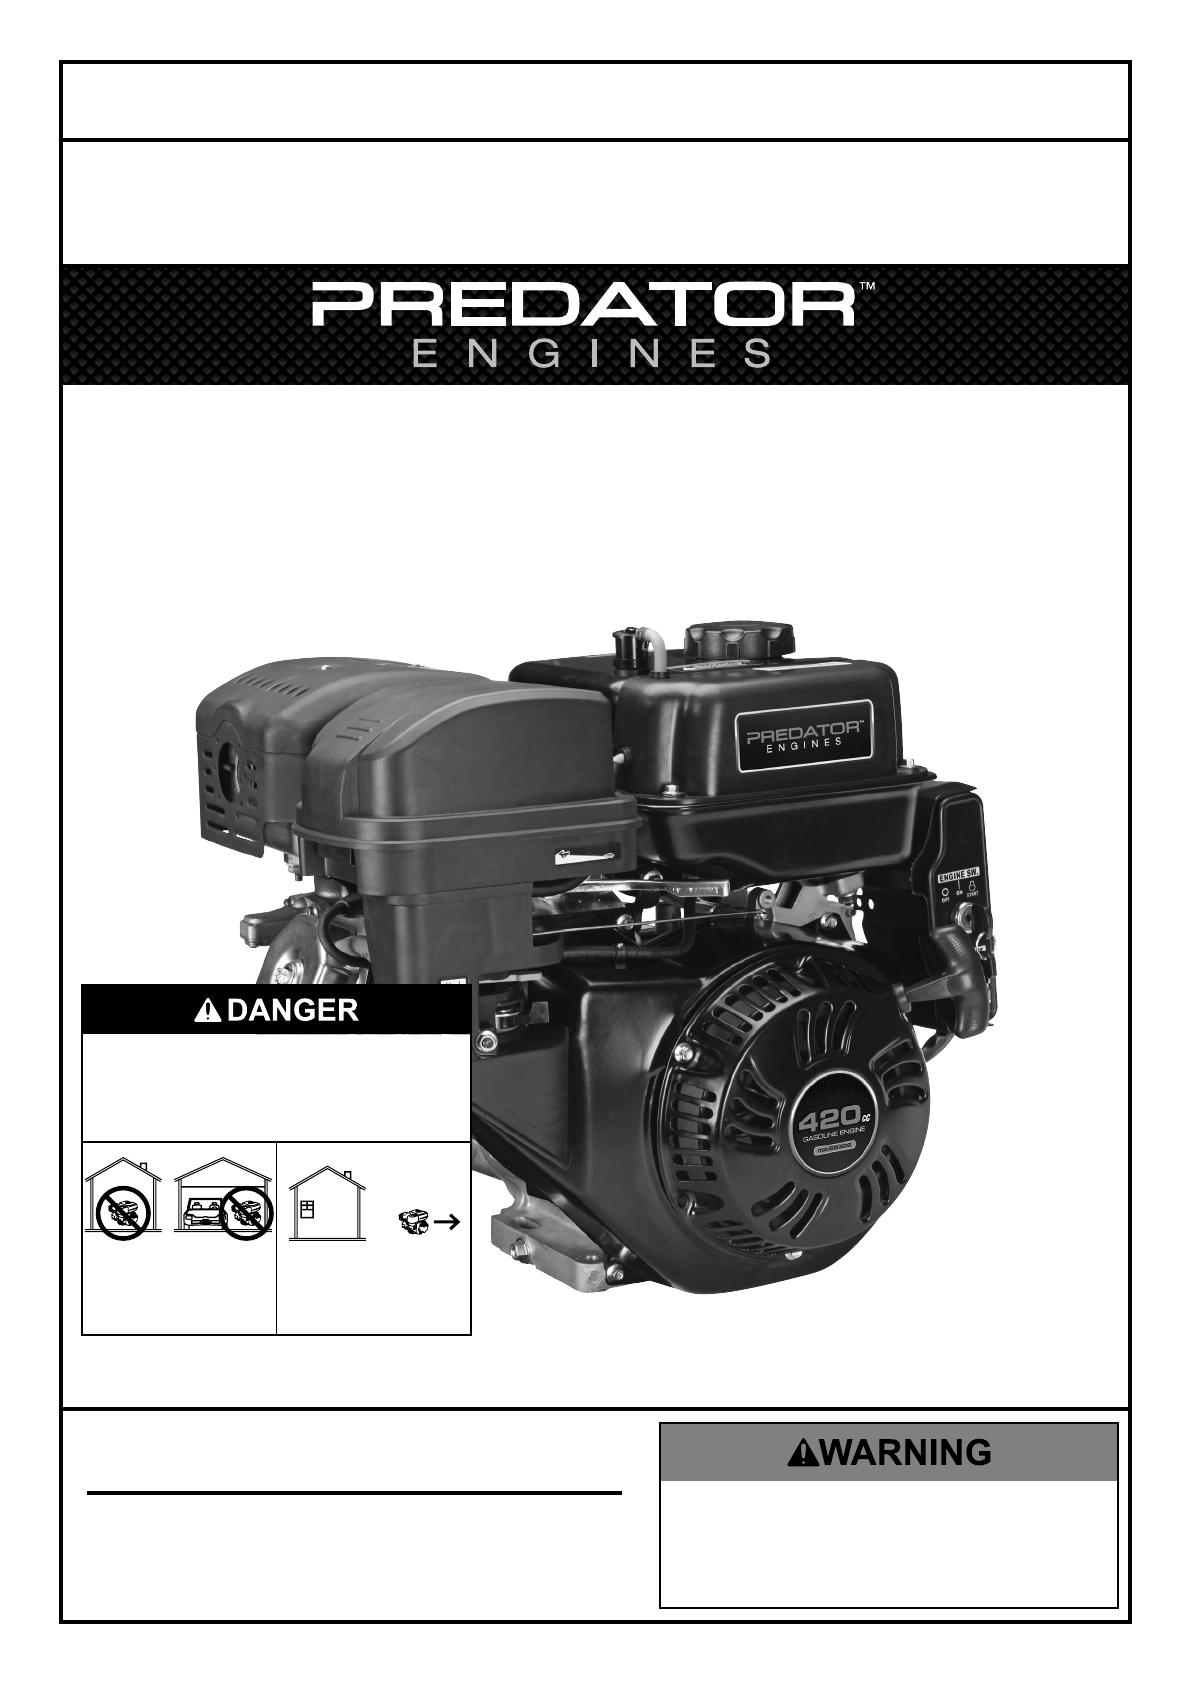 Loading Charging Coil For Harbor Freight Predator 13Hp 420